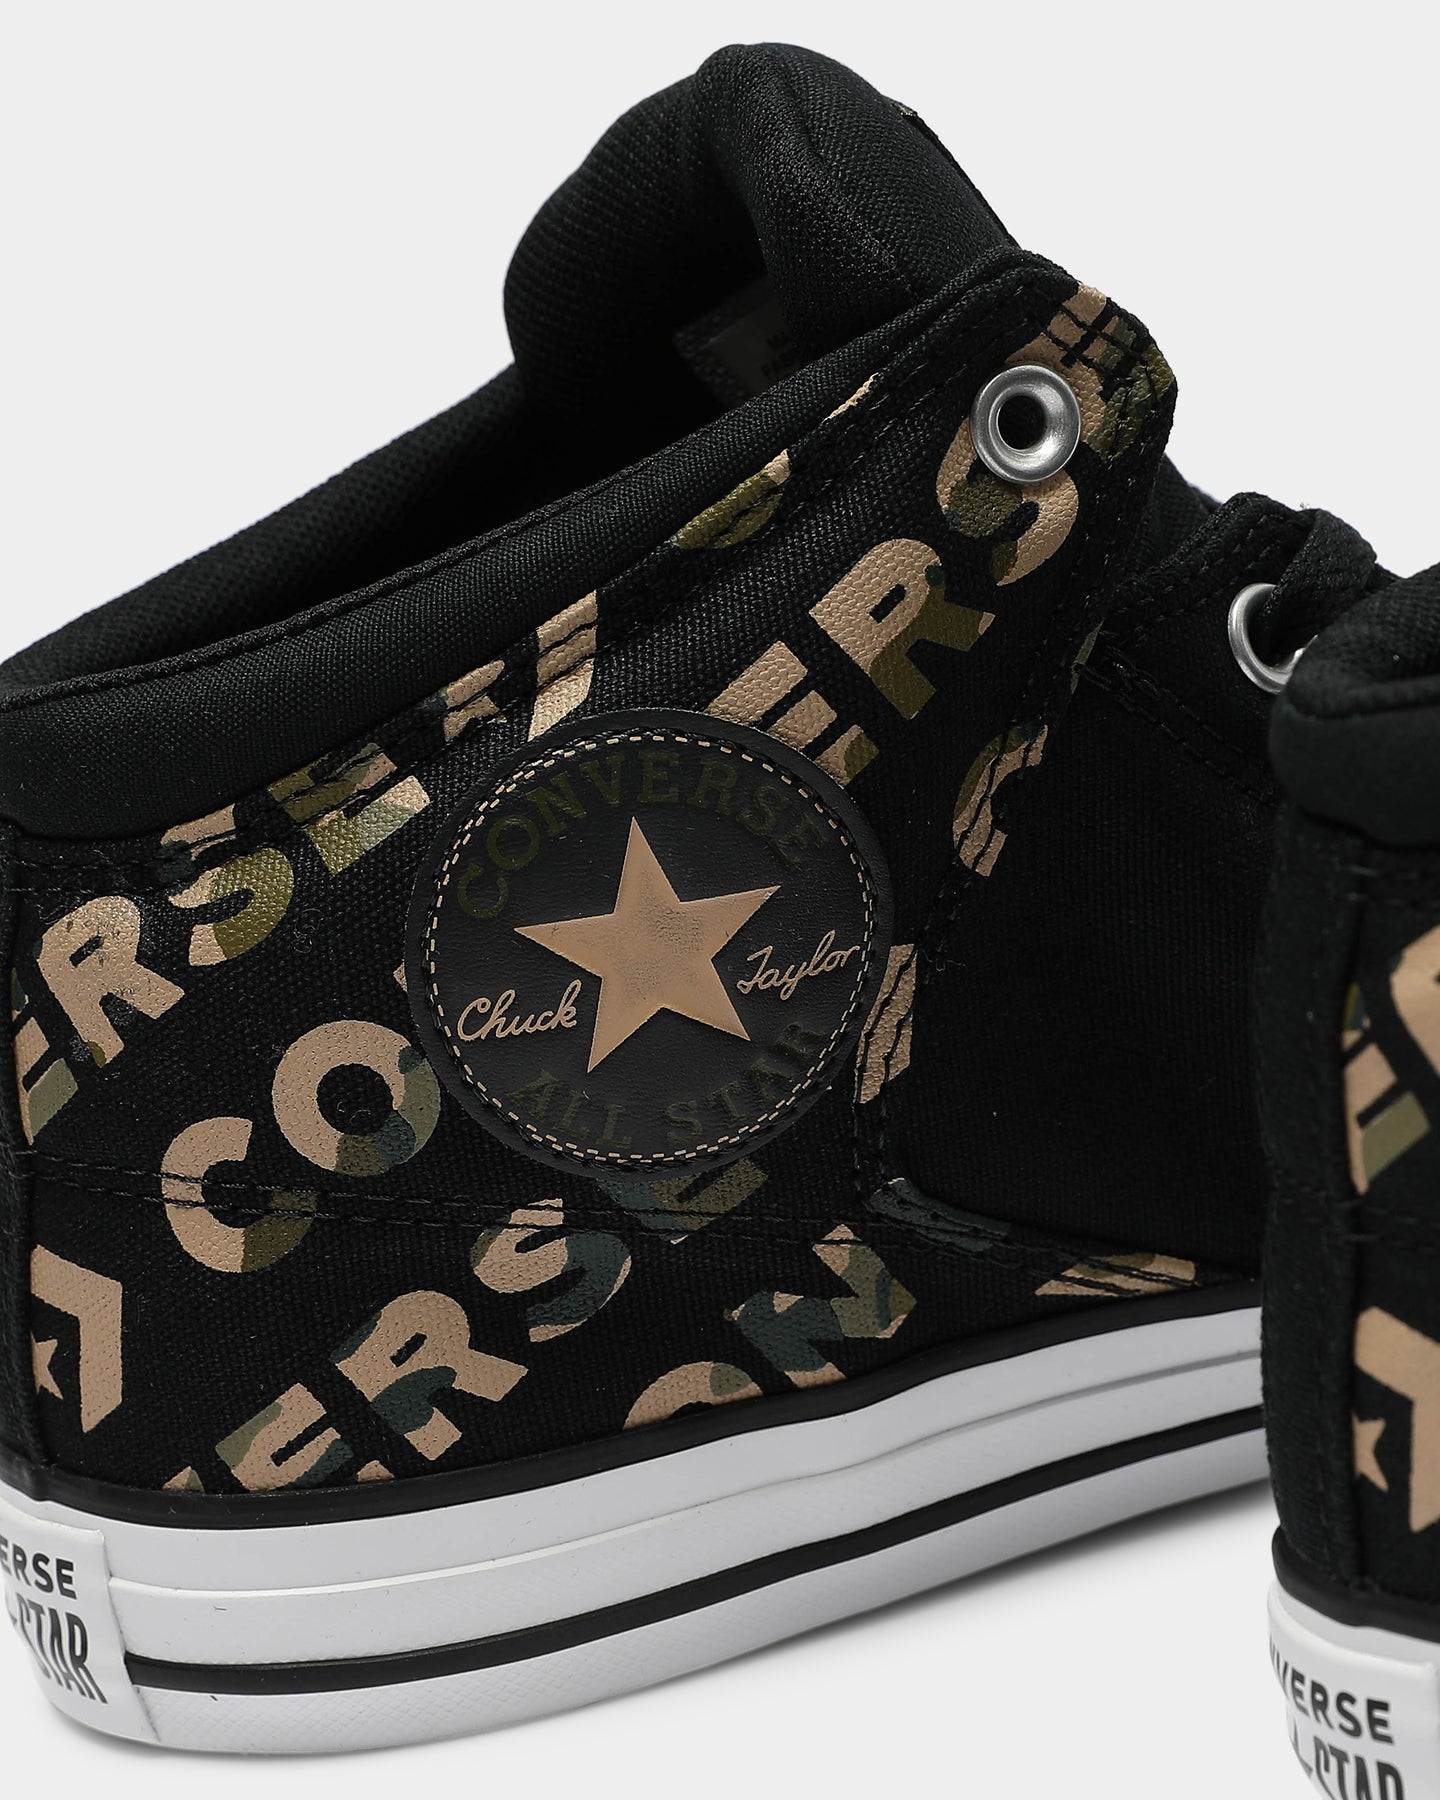 Converse CT All Star High Street BlackKhaki